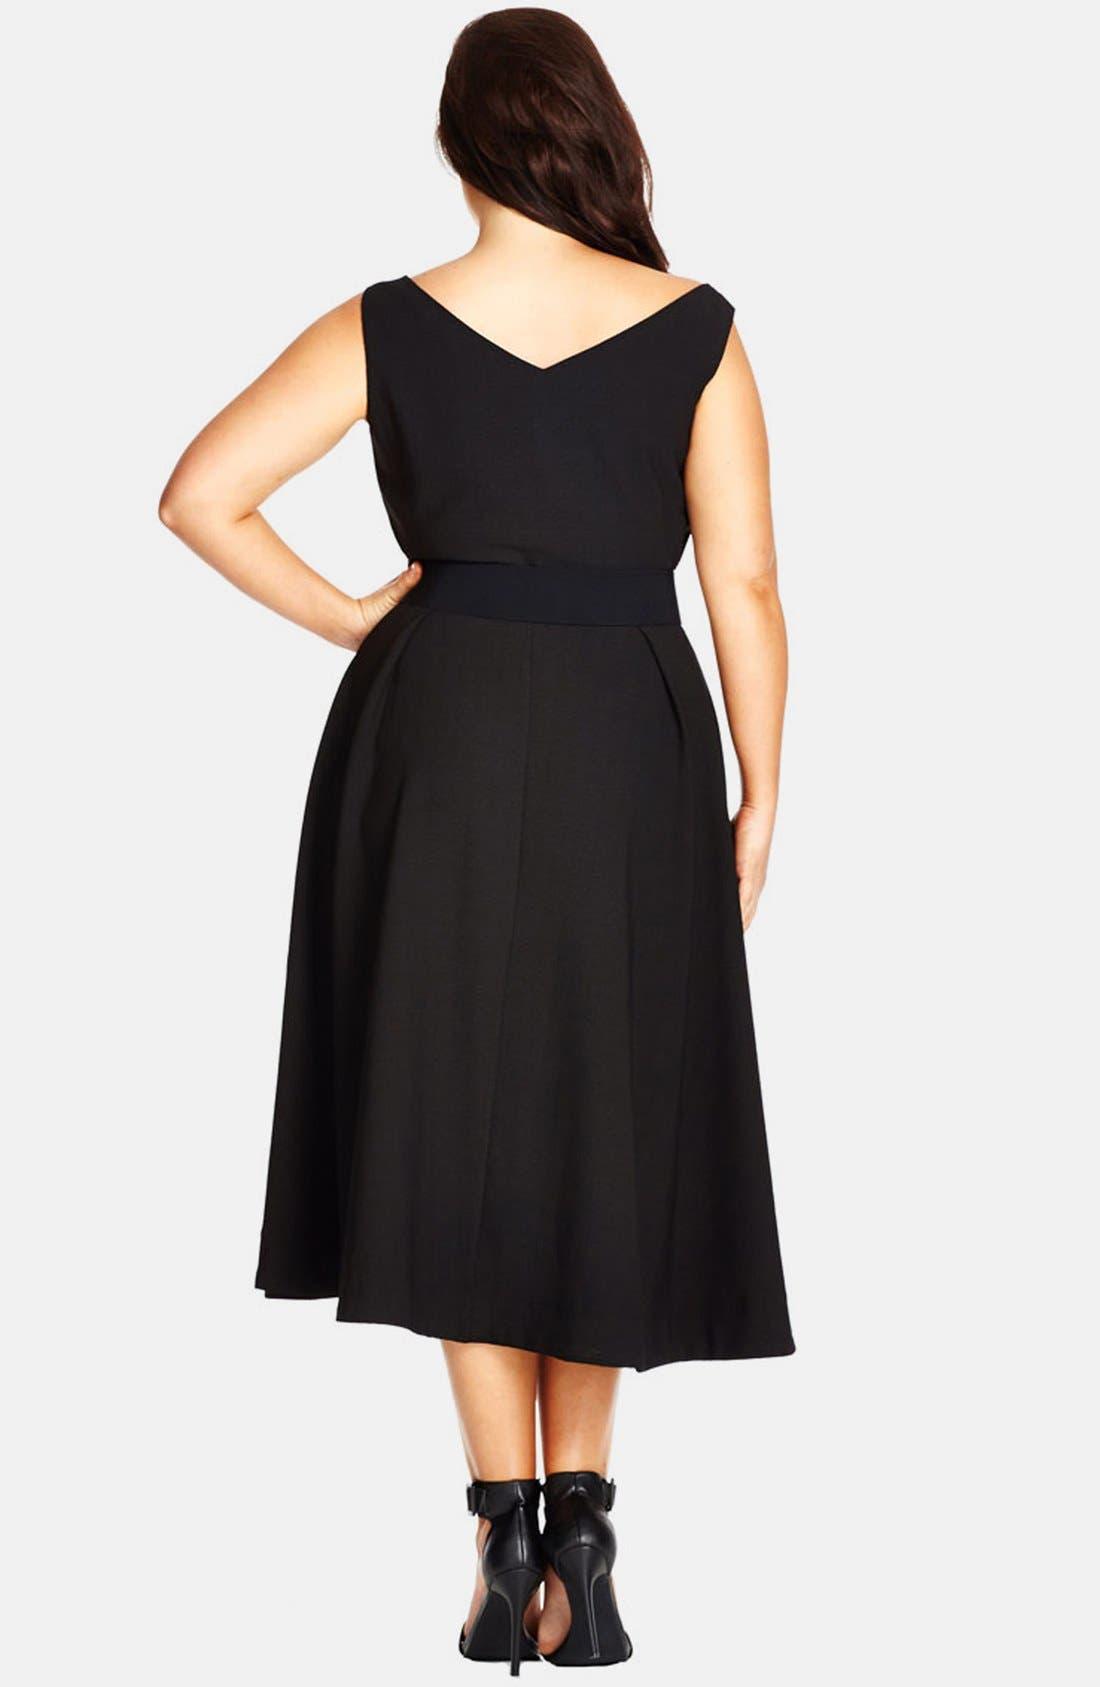 CITY CHIC, Belted Sweetheart Neck Tea Length Dress, Alternate thumbnail 2, color, BLACK